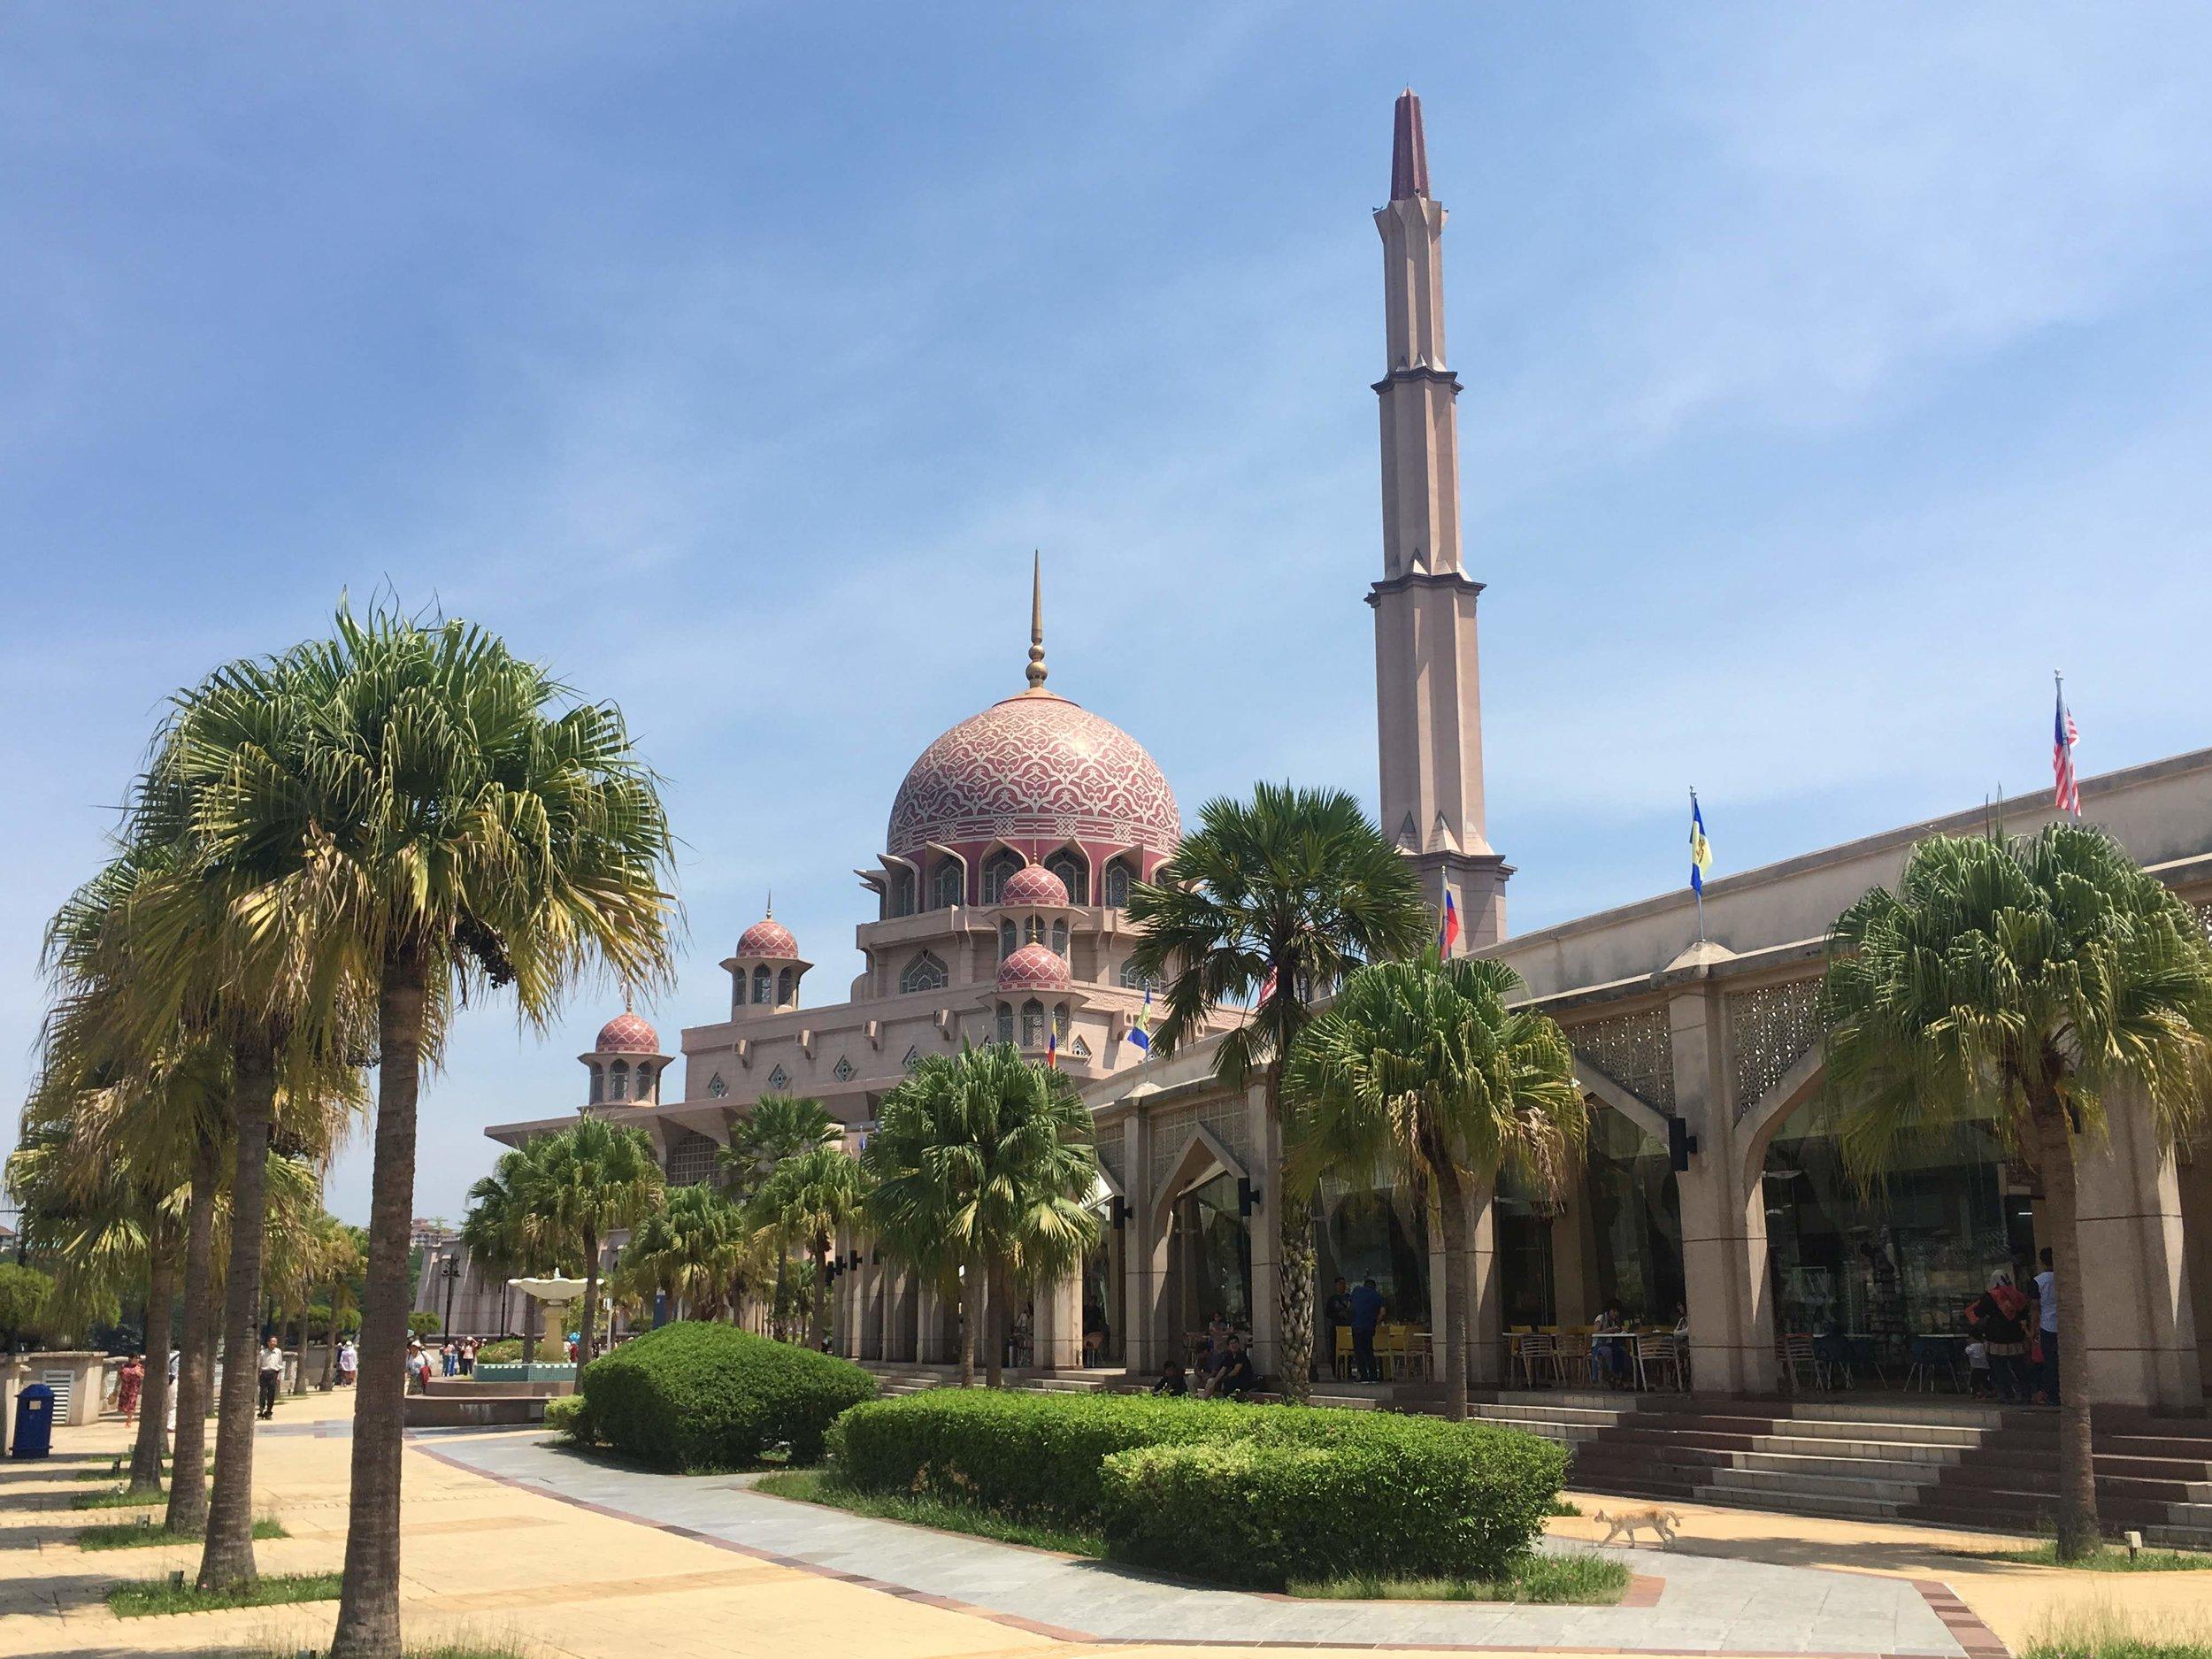 the Masjid Putra in Putrajaya, Malaysia